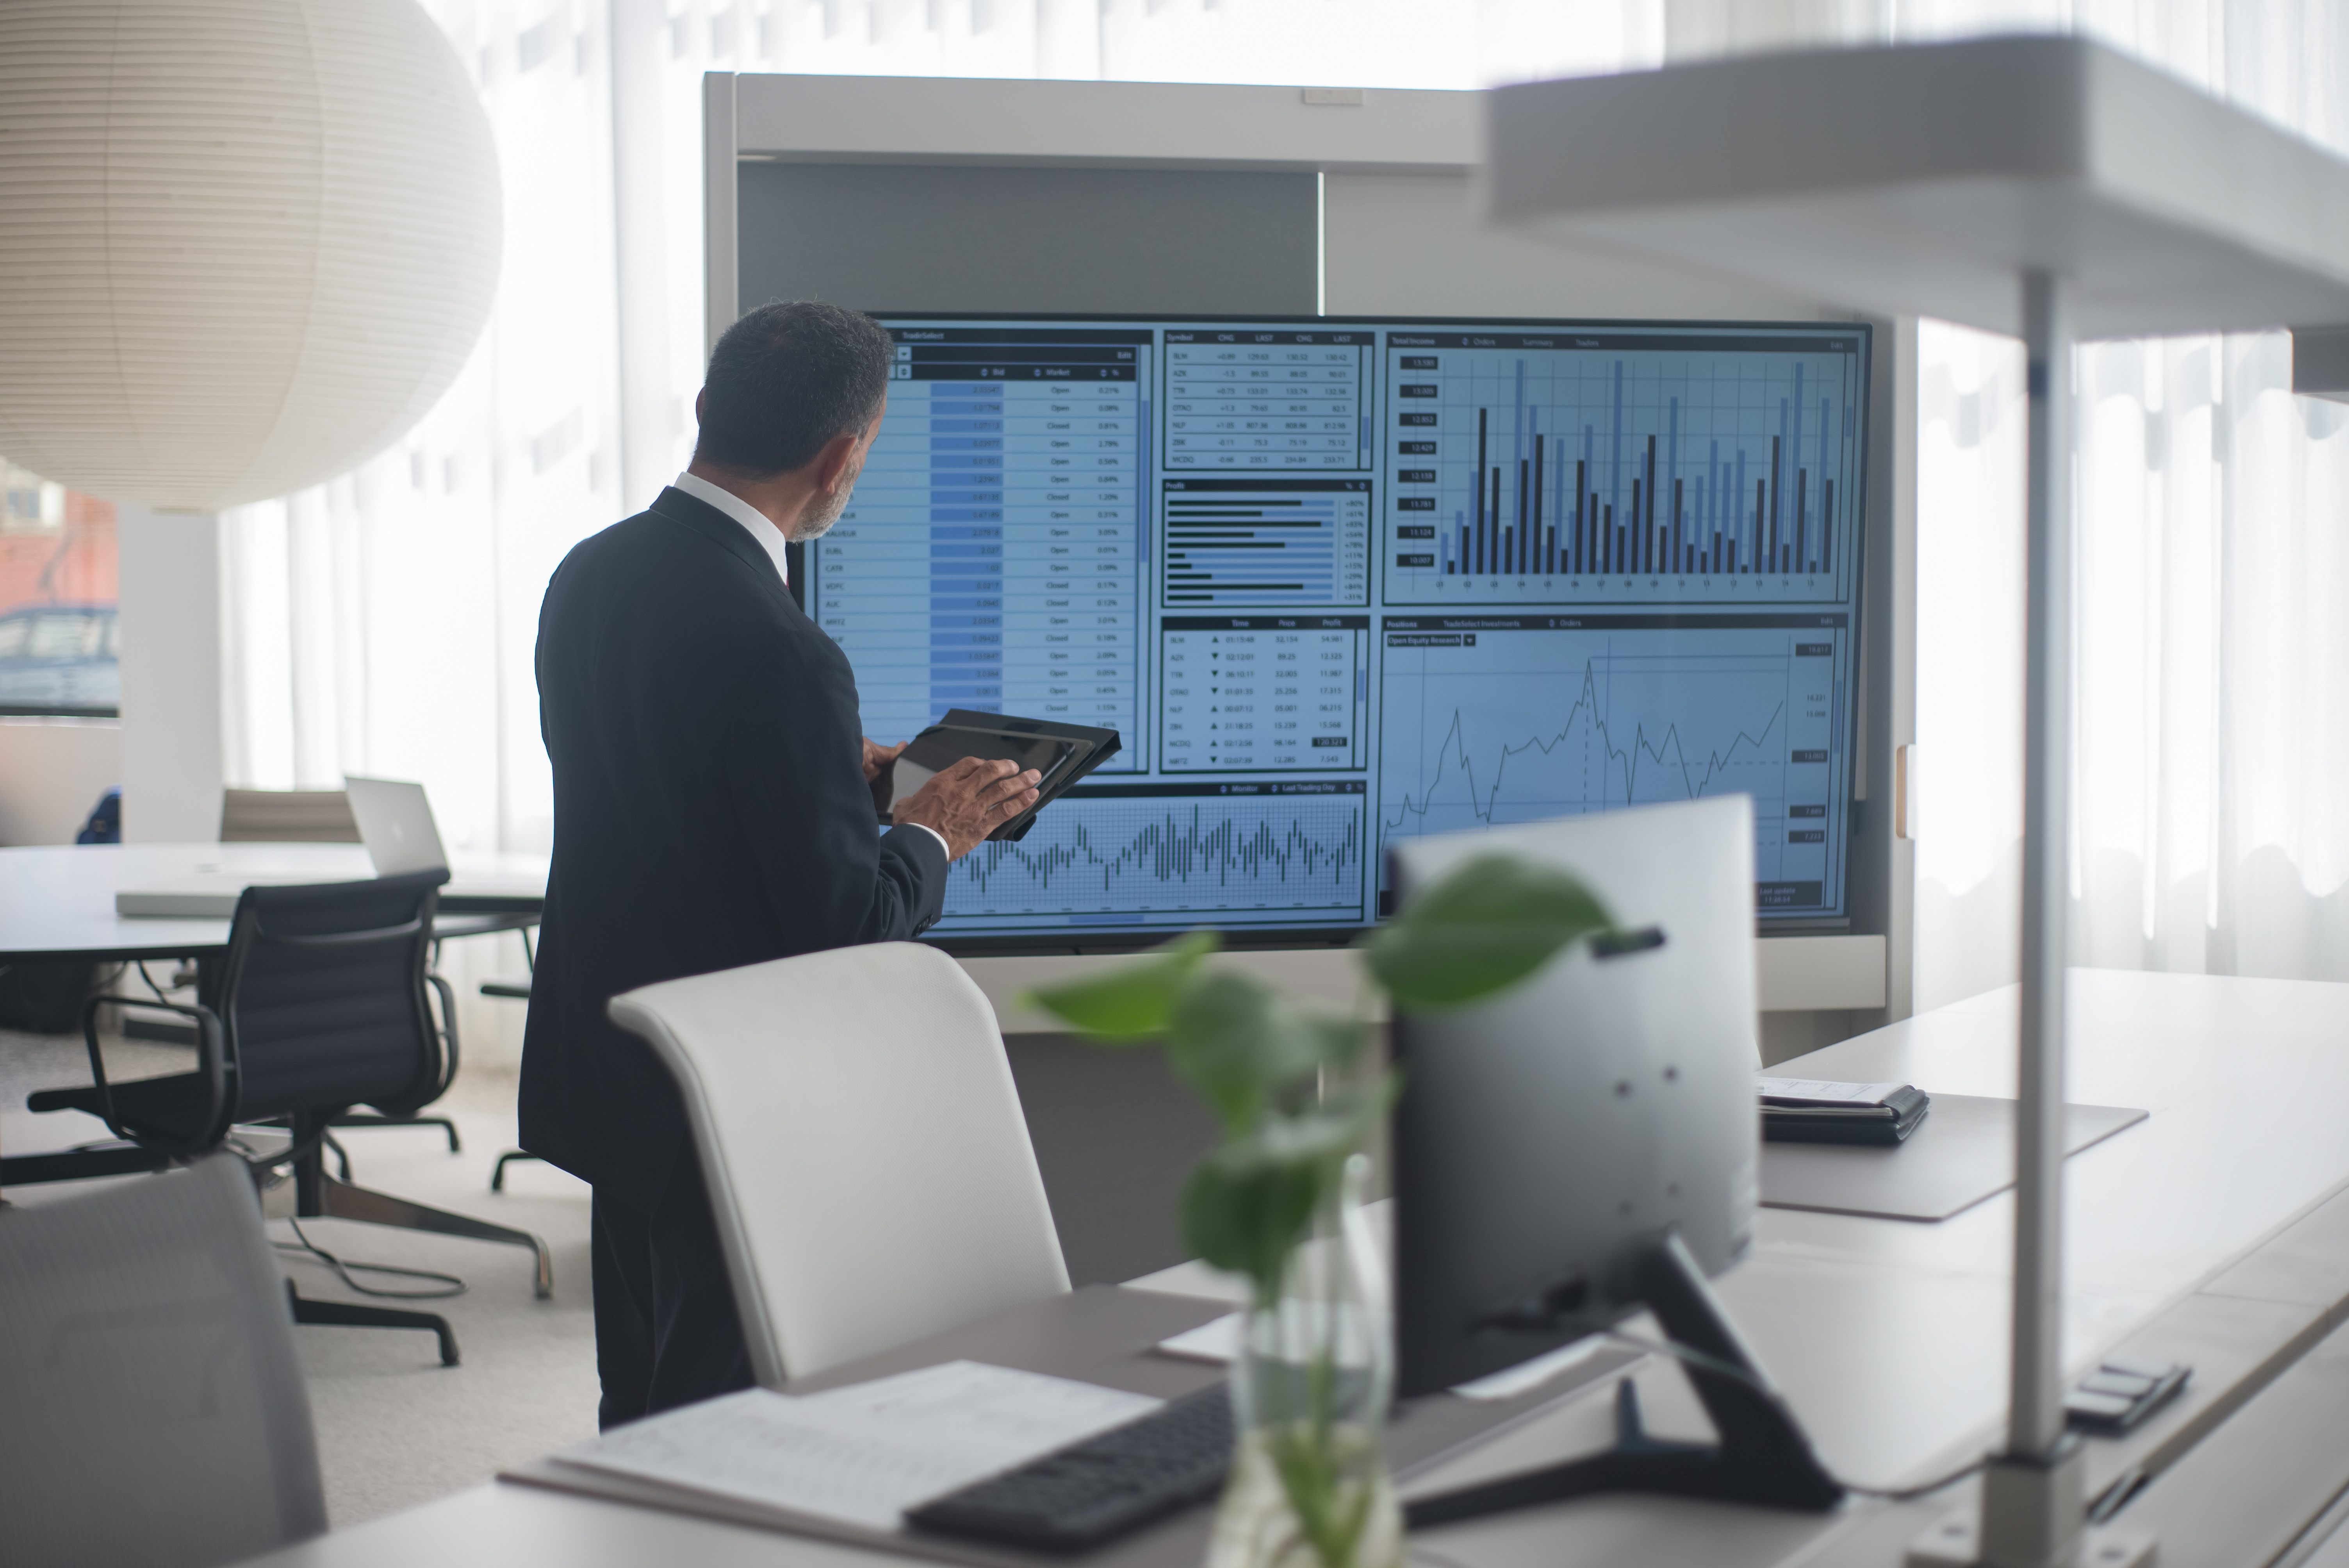 dataroom software